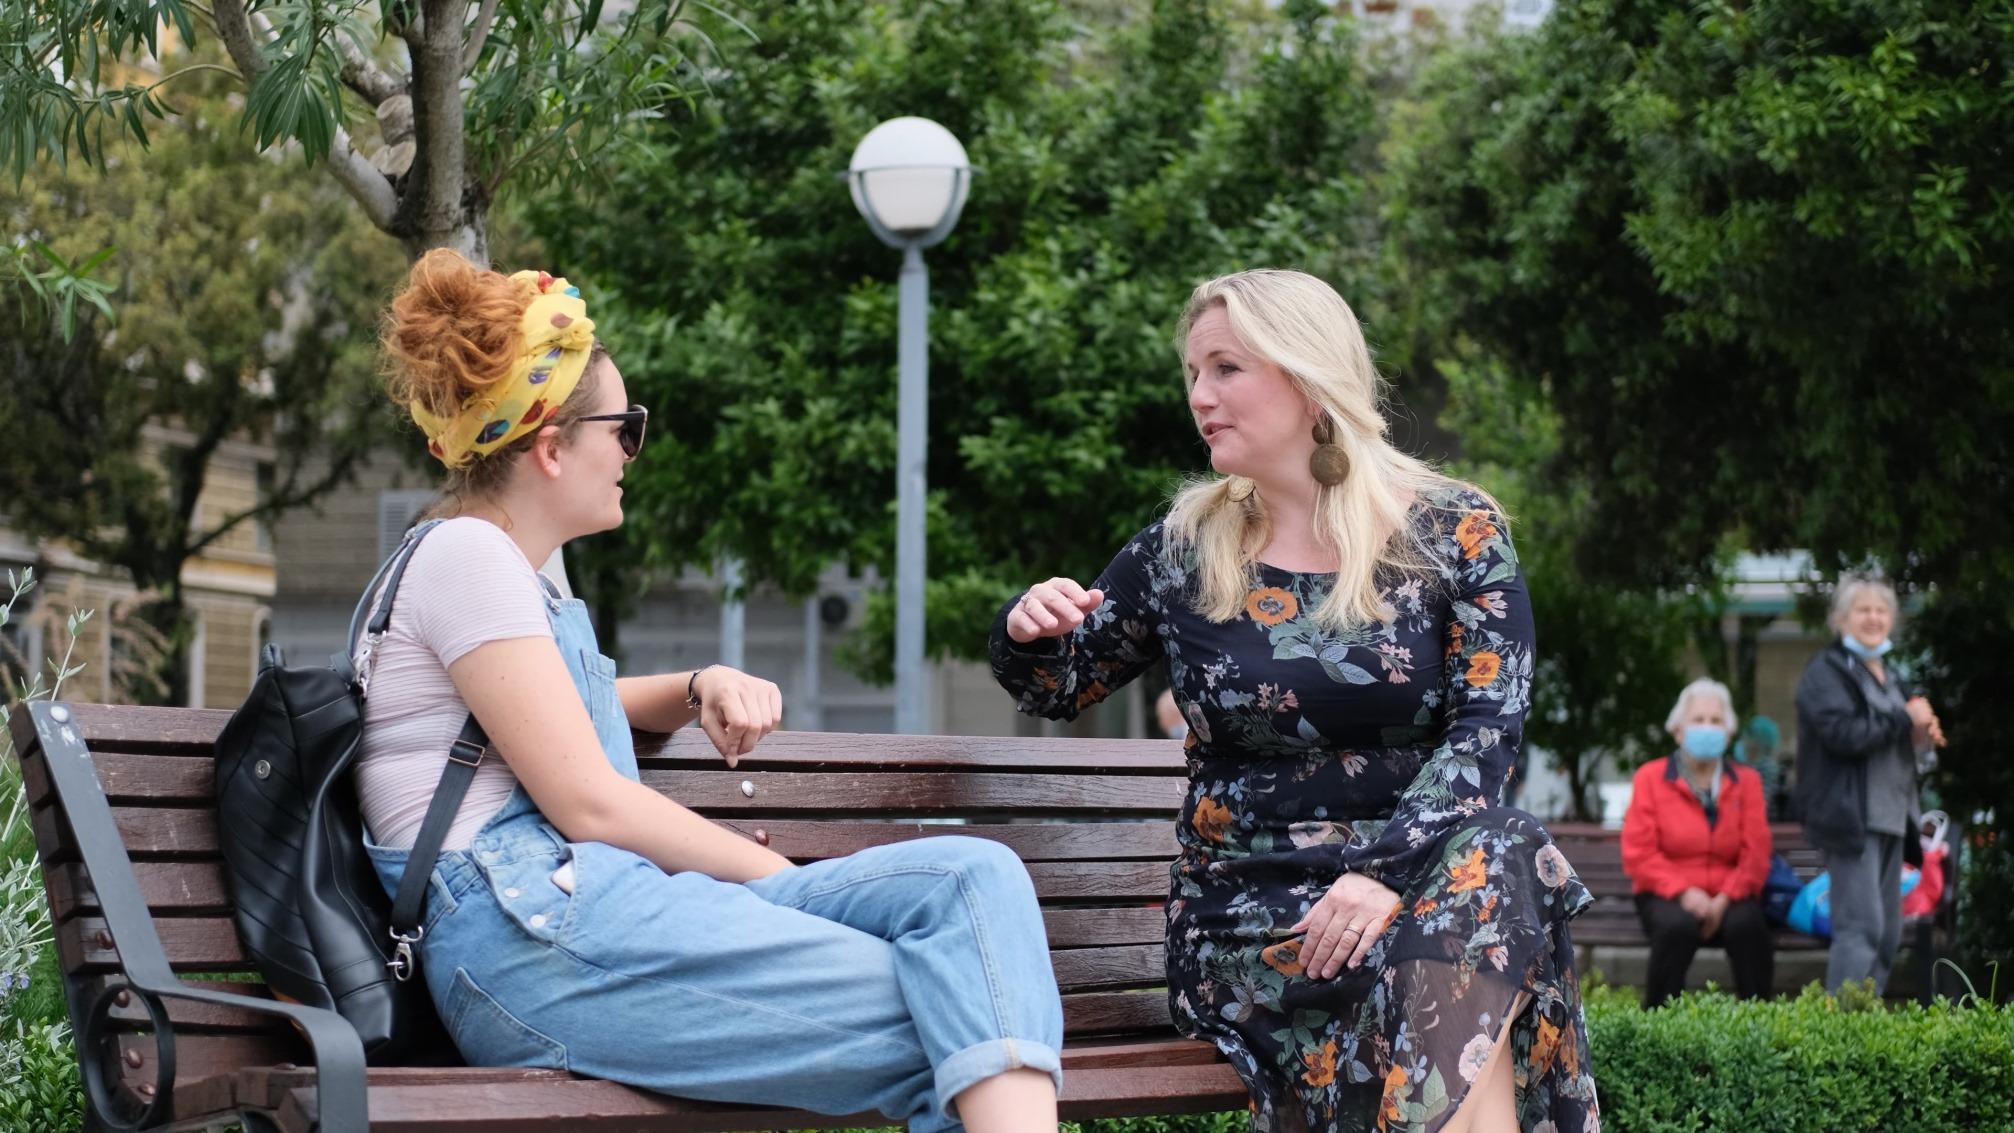 Extravagant interview: Leonora Surian Popov